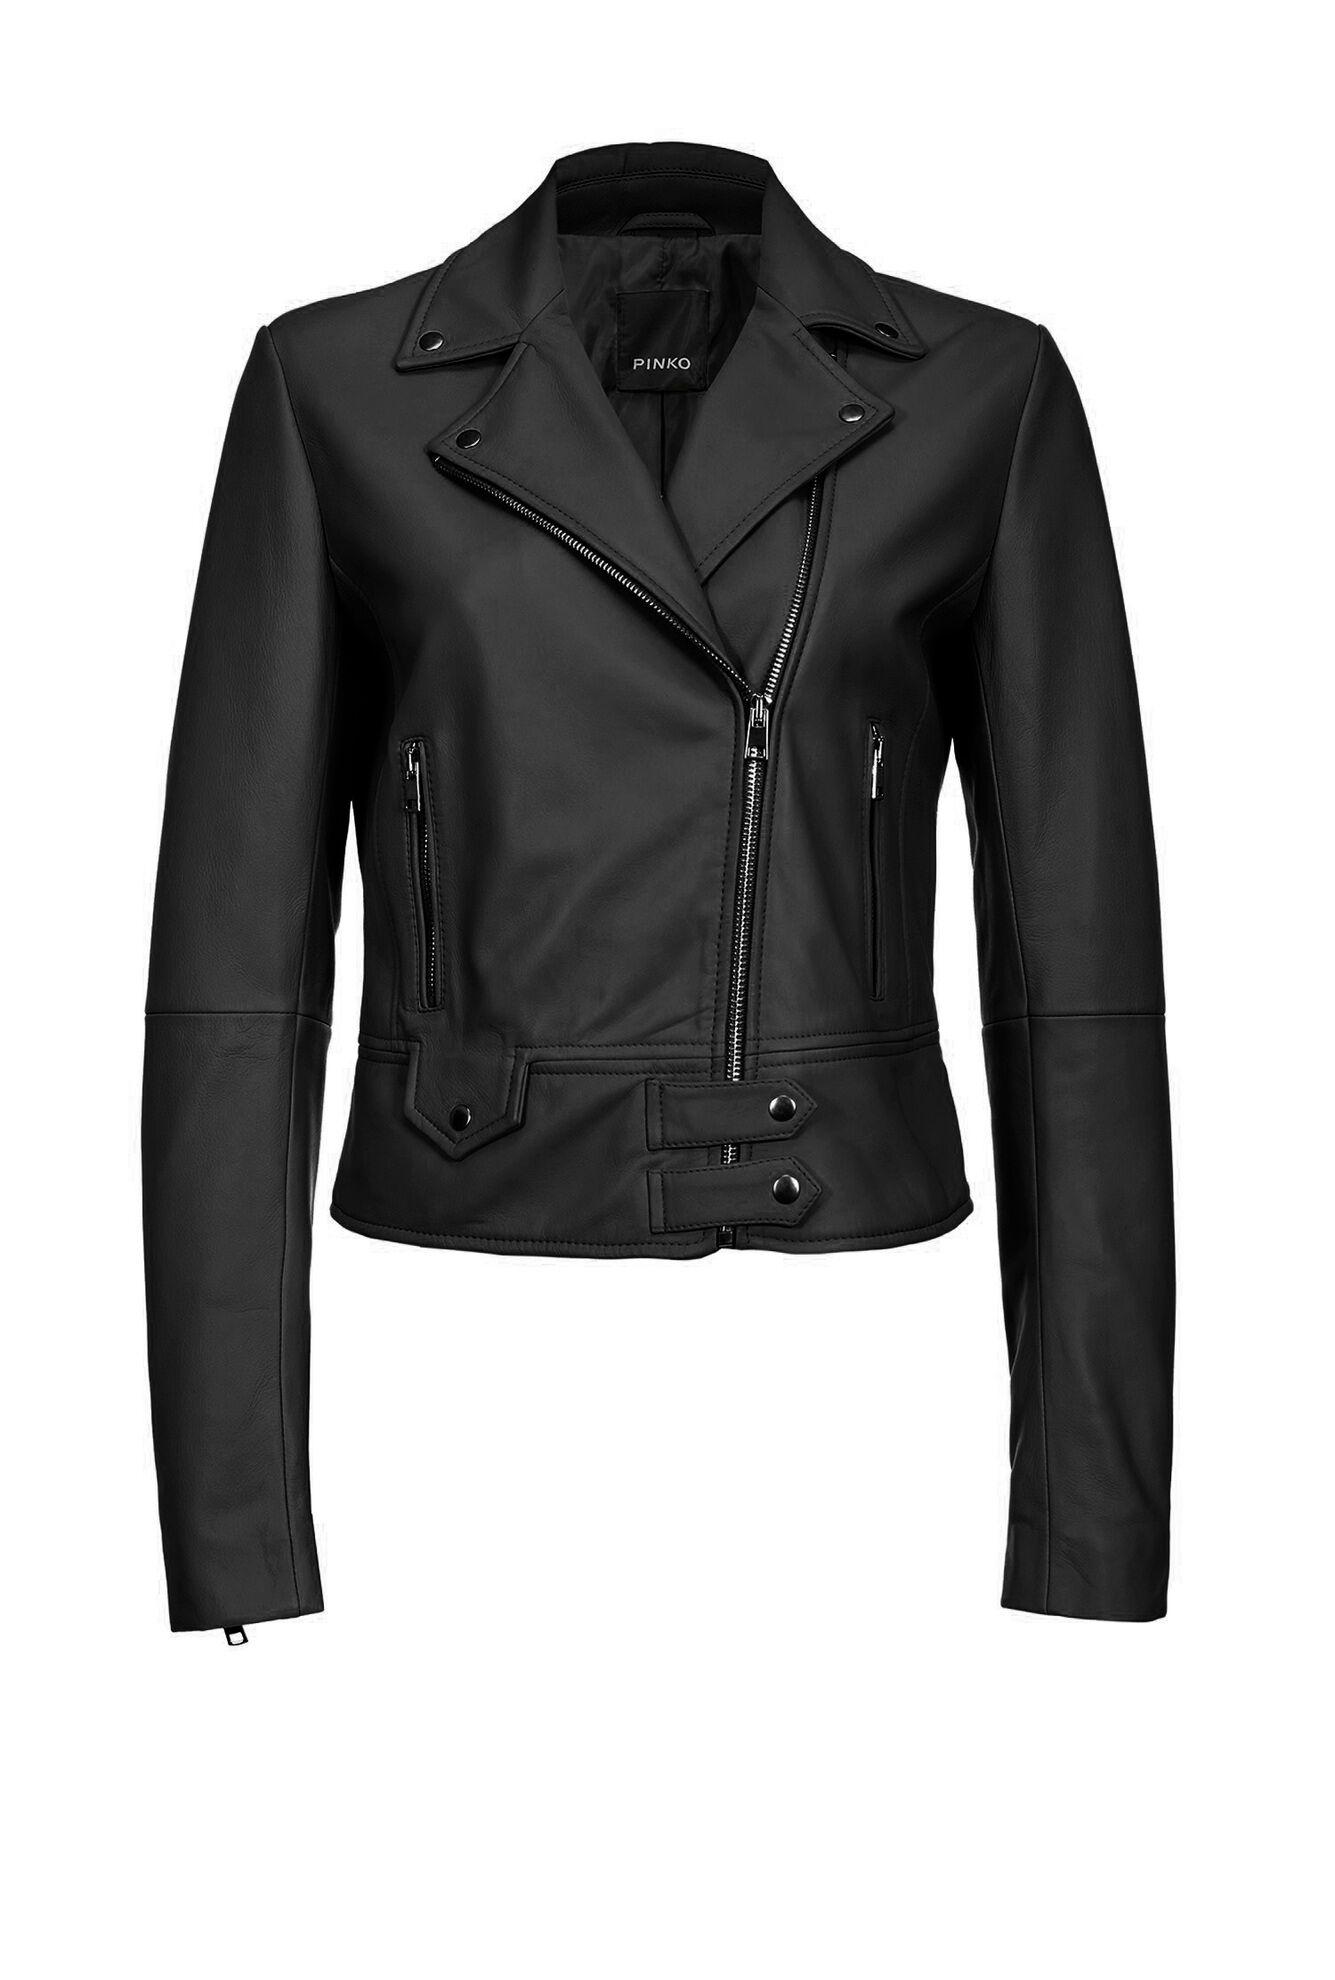 Leather Biker Jacket - Pinko